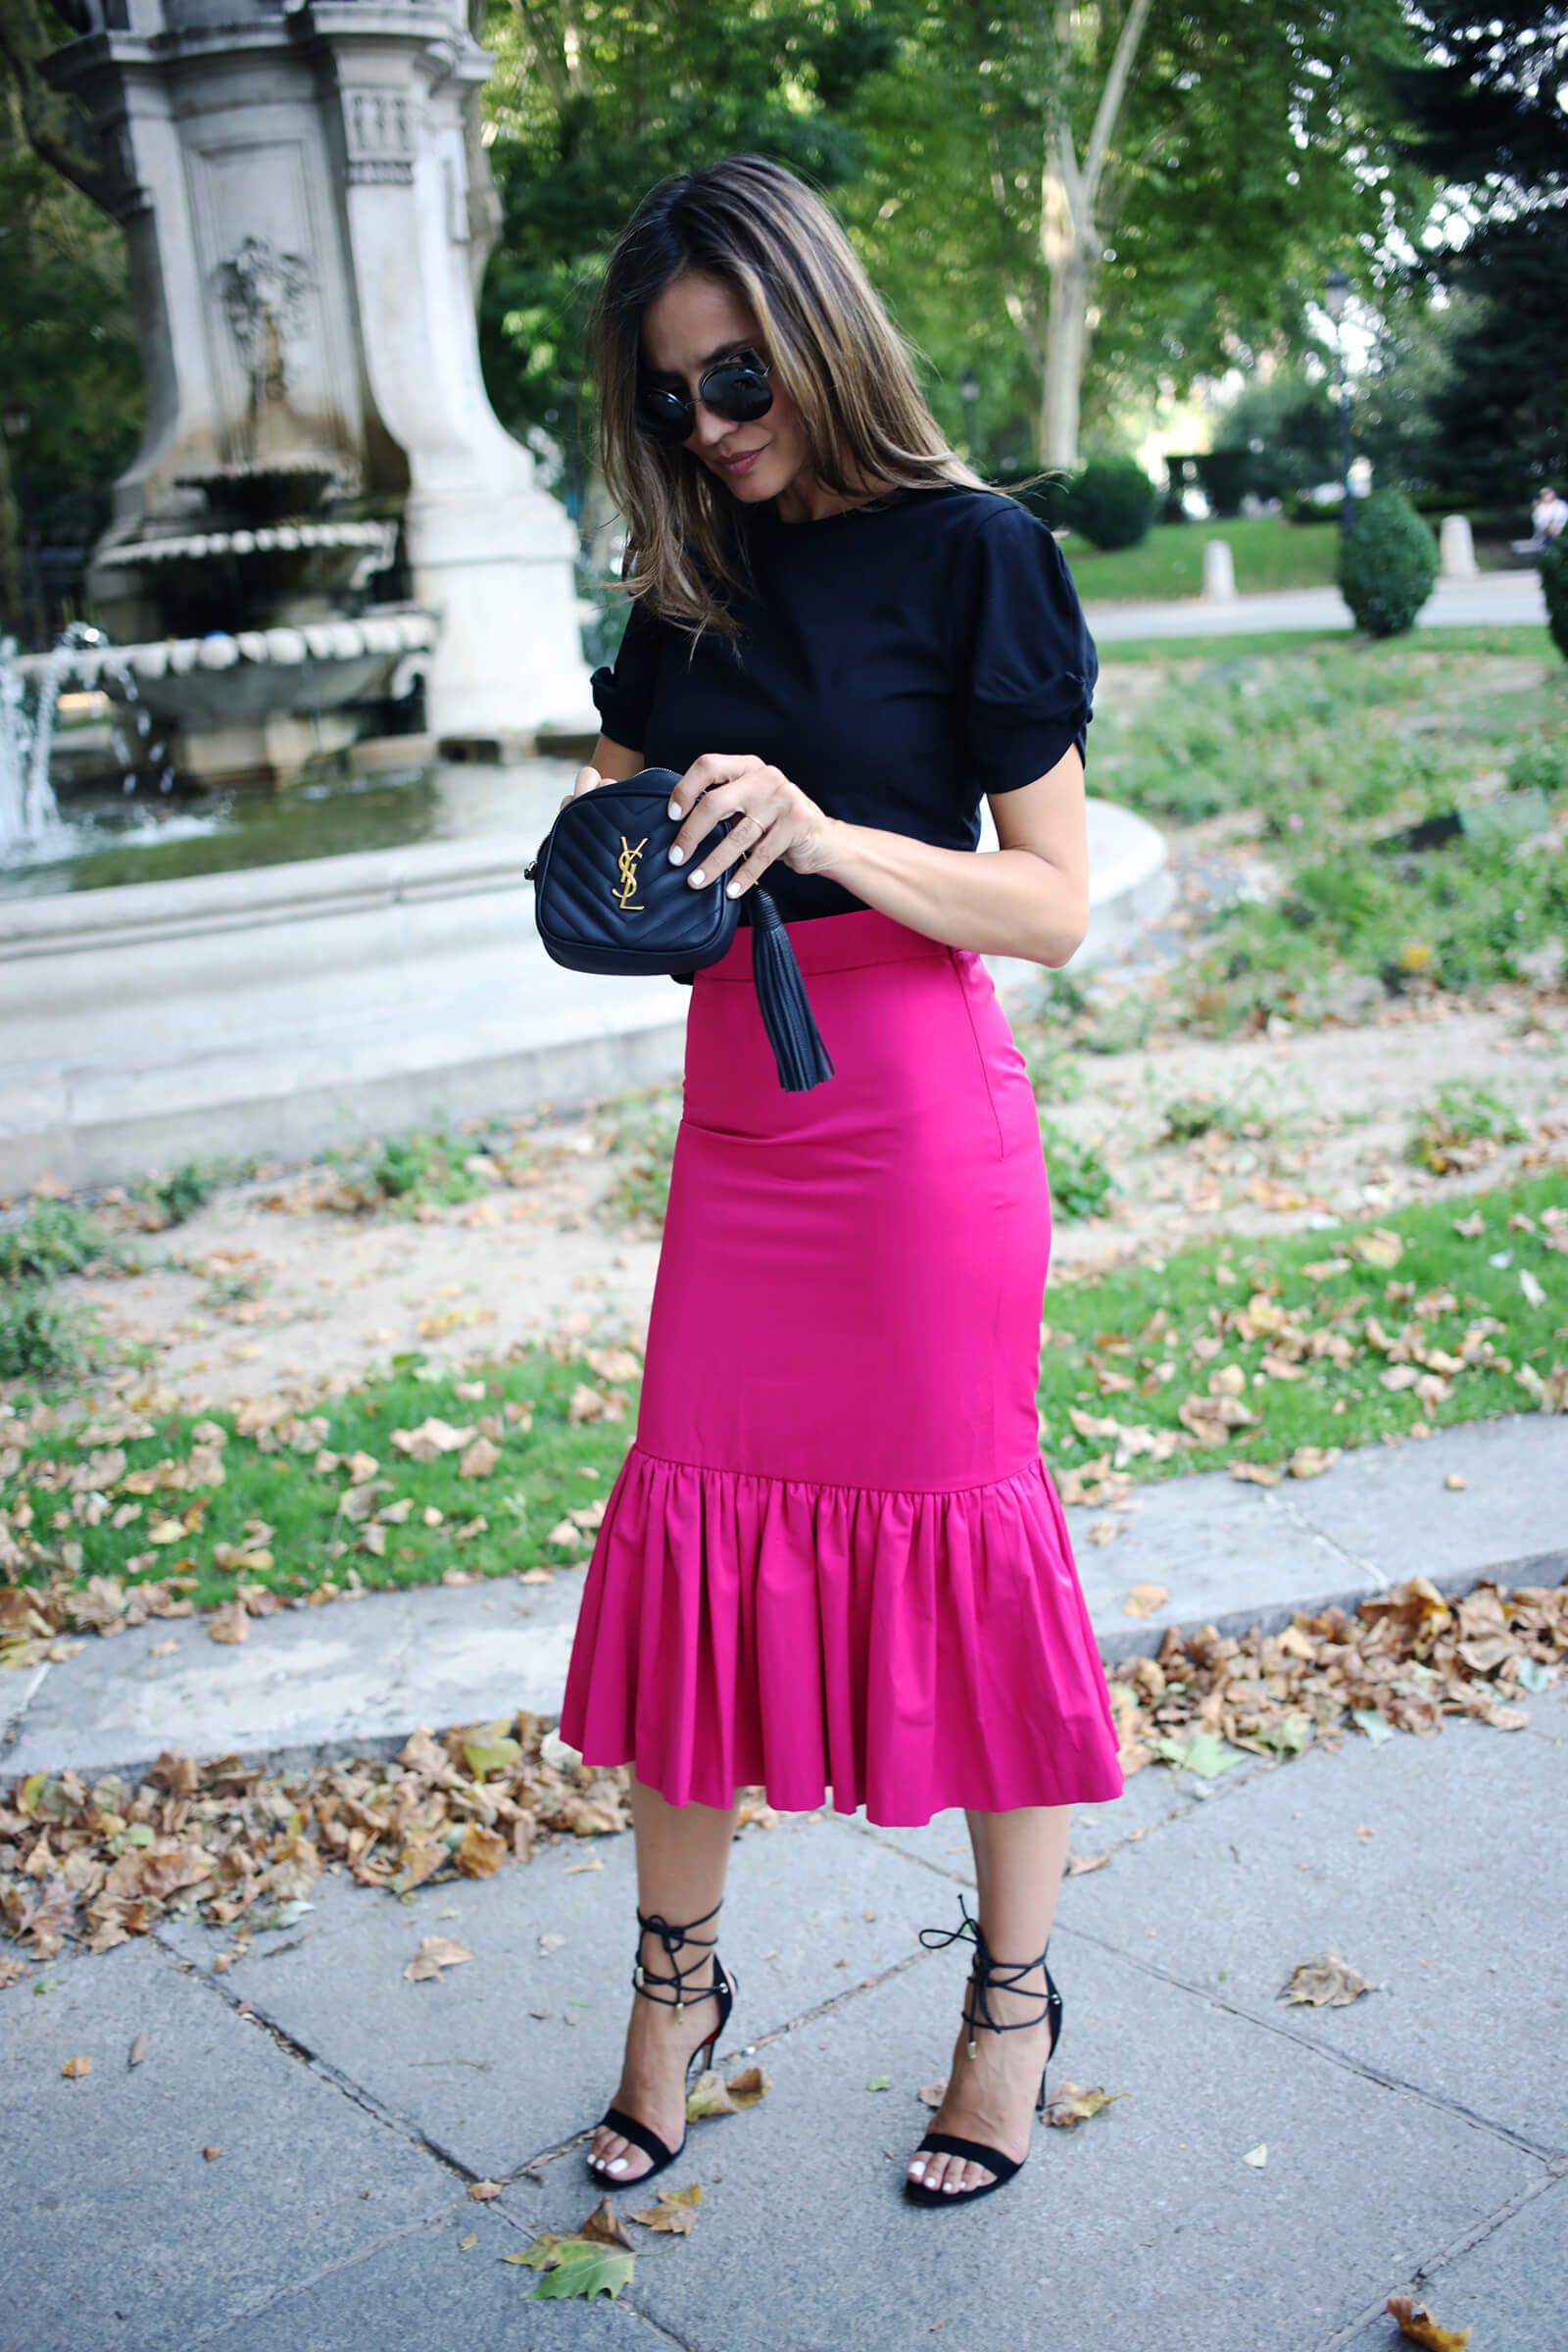 Combinada Falda Fucsia De Con Sandalias Negras Skirt TirasPencil Ifyv7b6Yg